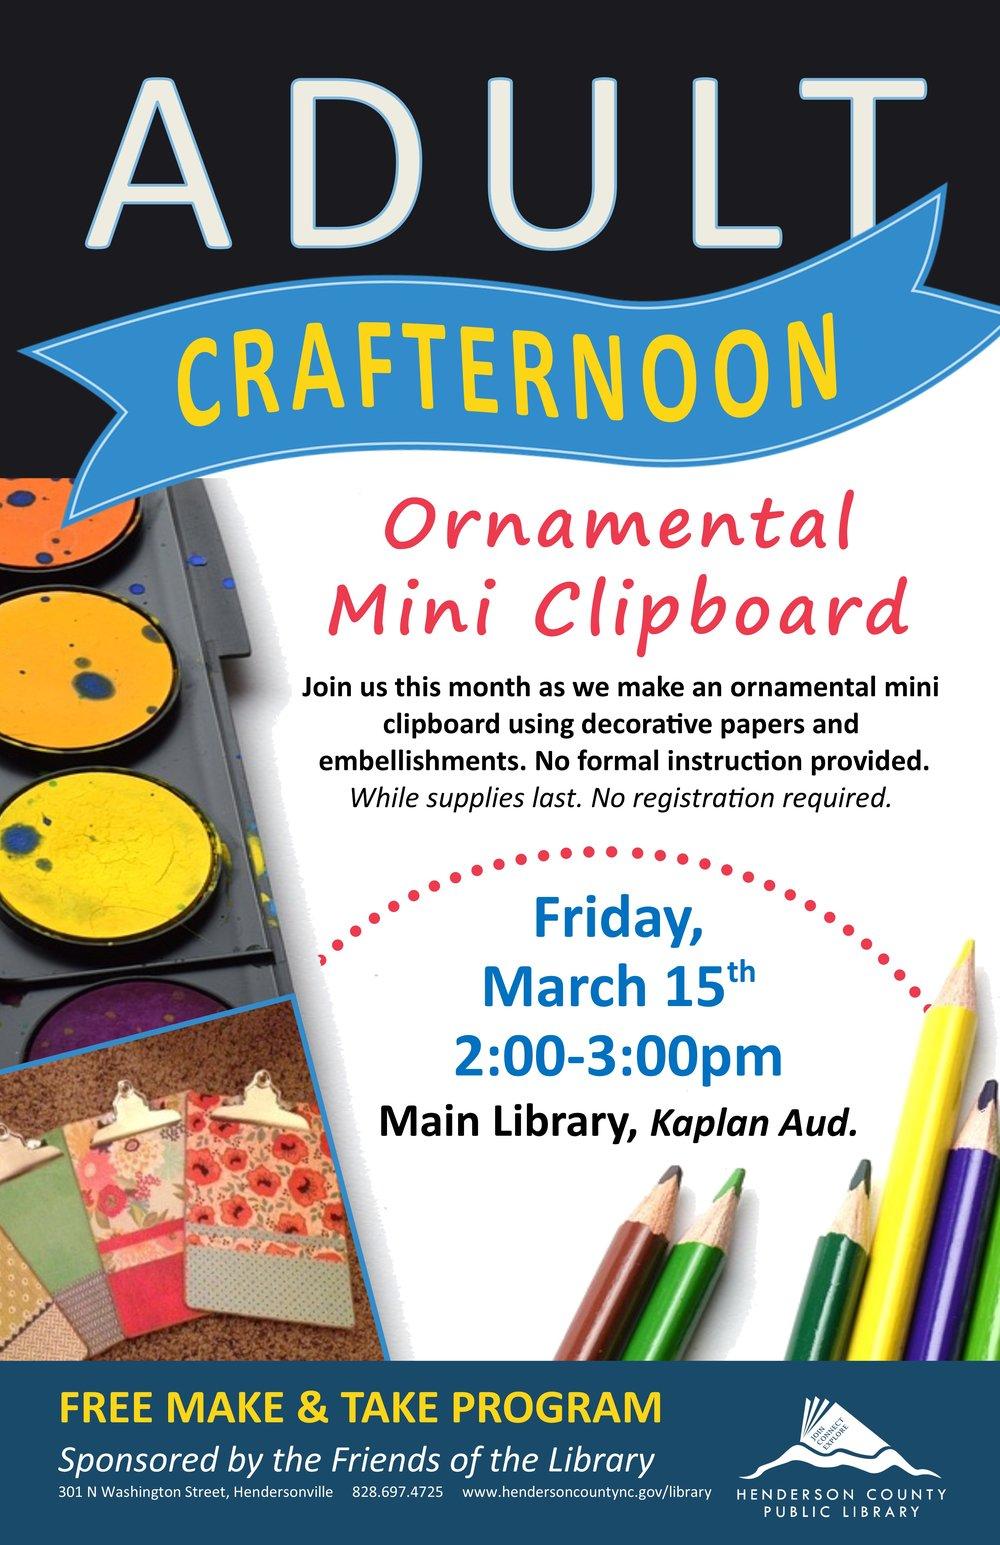 Adult Crafternoon Ornamental Mini Clipboard March.jpg